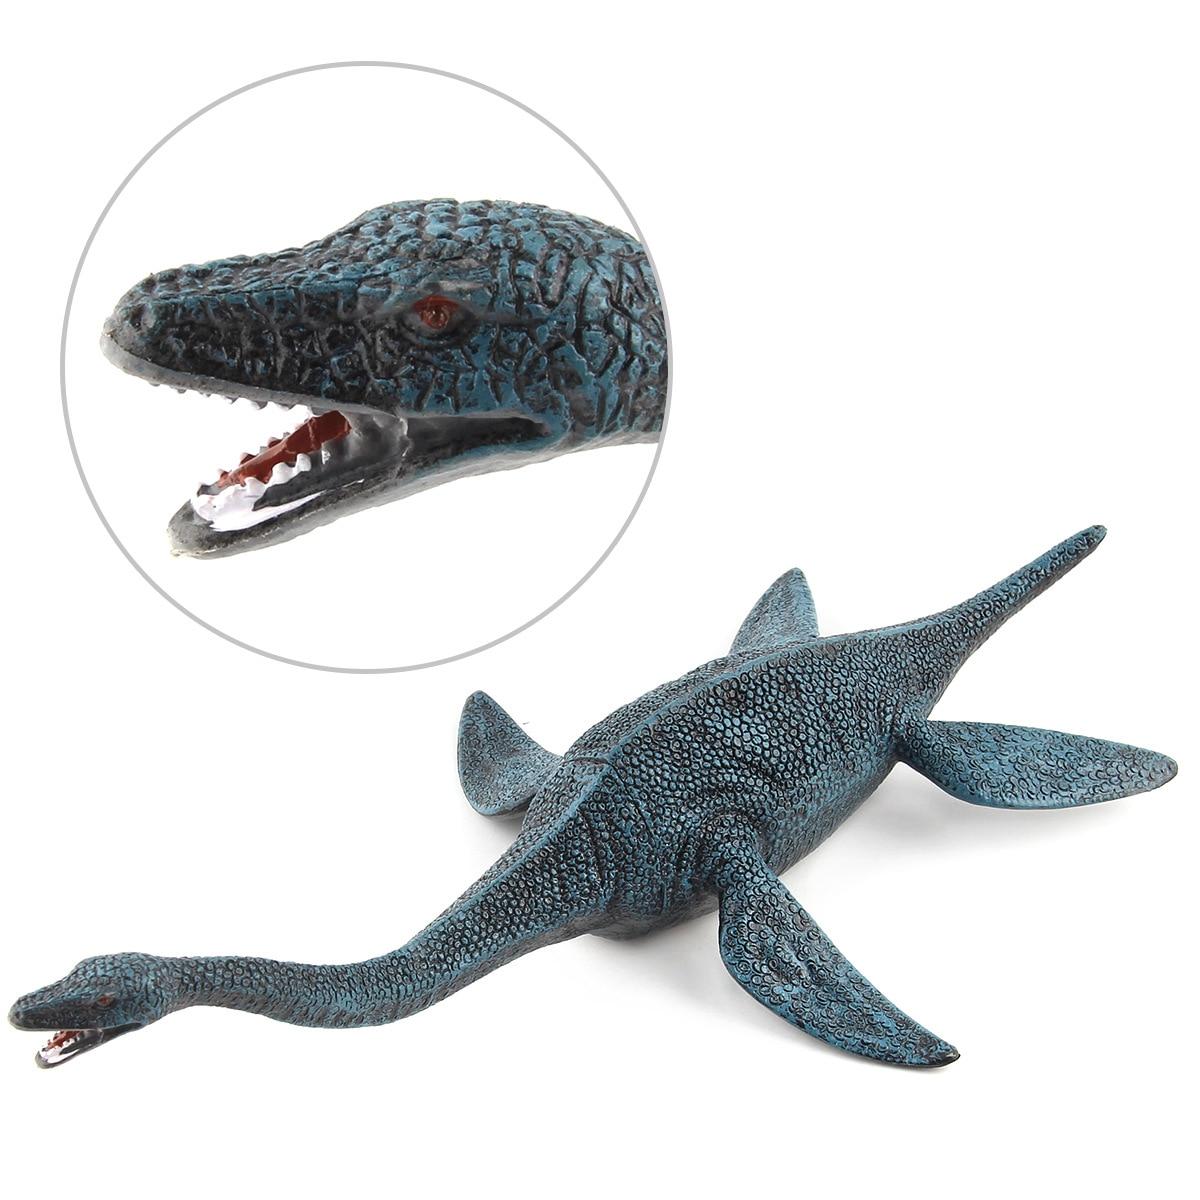 Plesiosaur Model Plastic Doll Simulation Dinosaur Hand Model Toy 25x45cm simulation dove model toy plastic foam